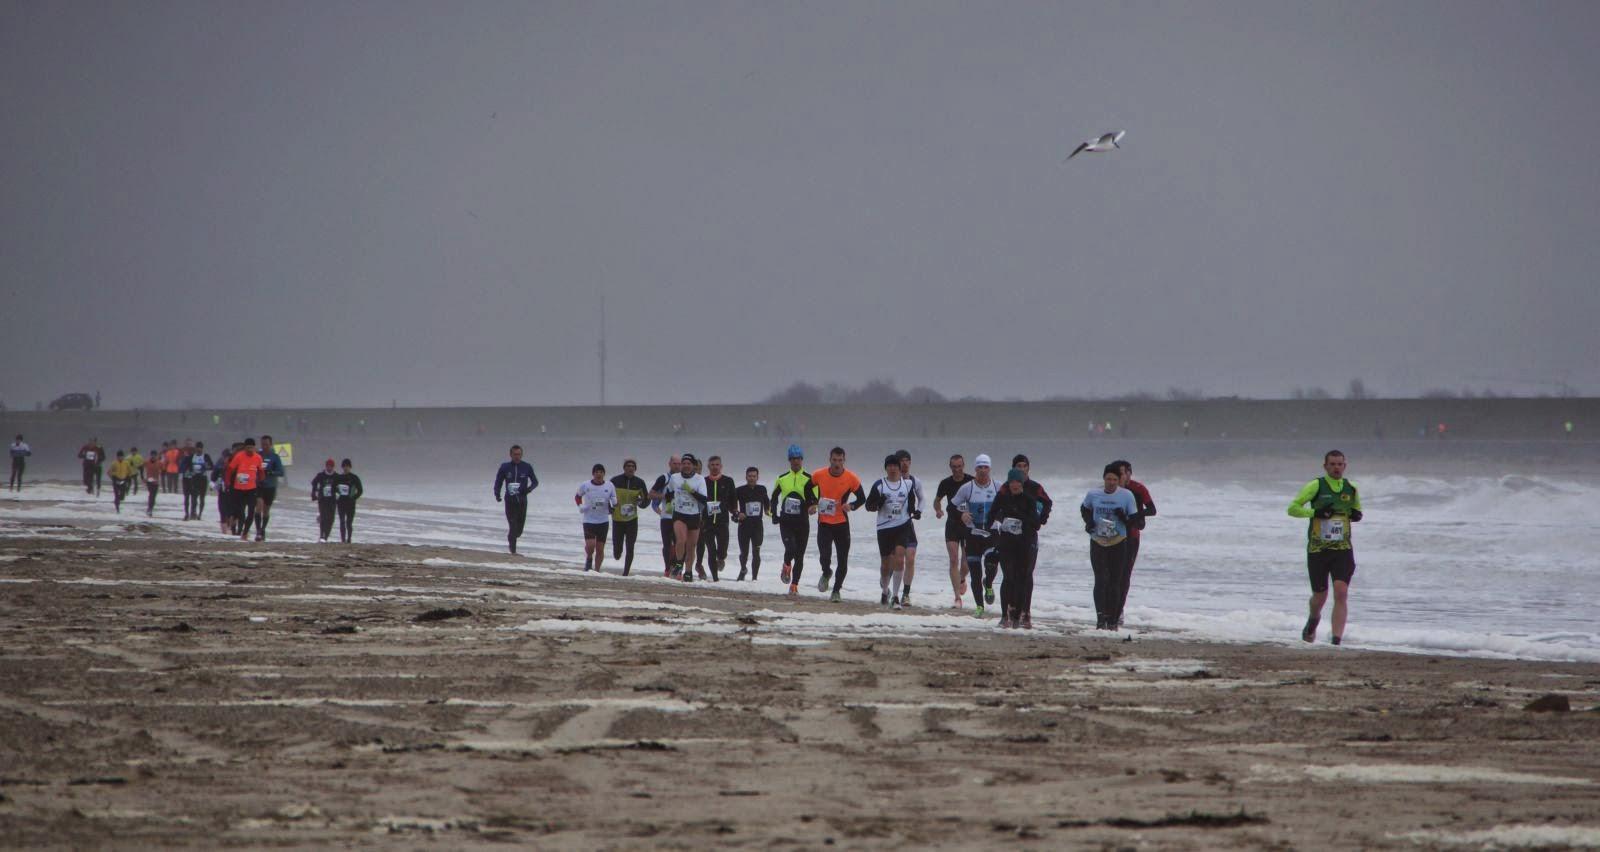 Sportfamilie Van Den Abeele Dpo Midwinter Halve Marathon Van Cadzand